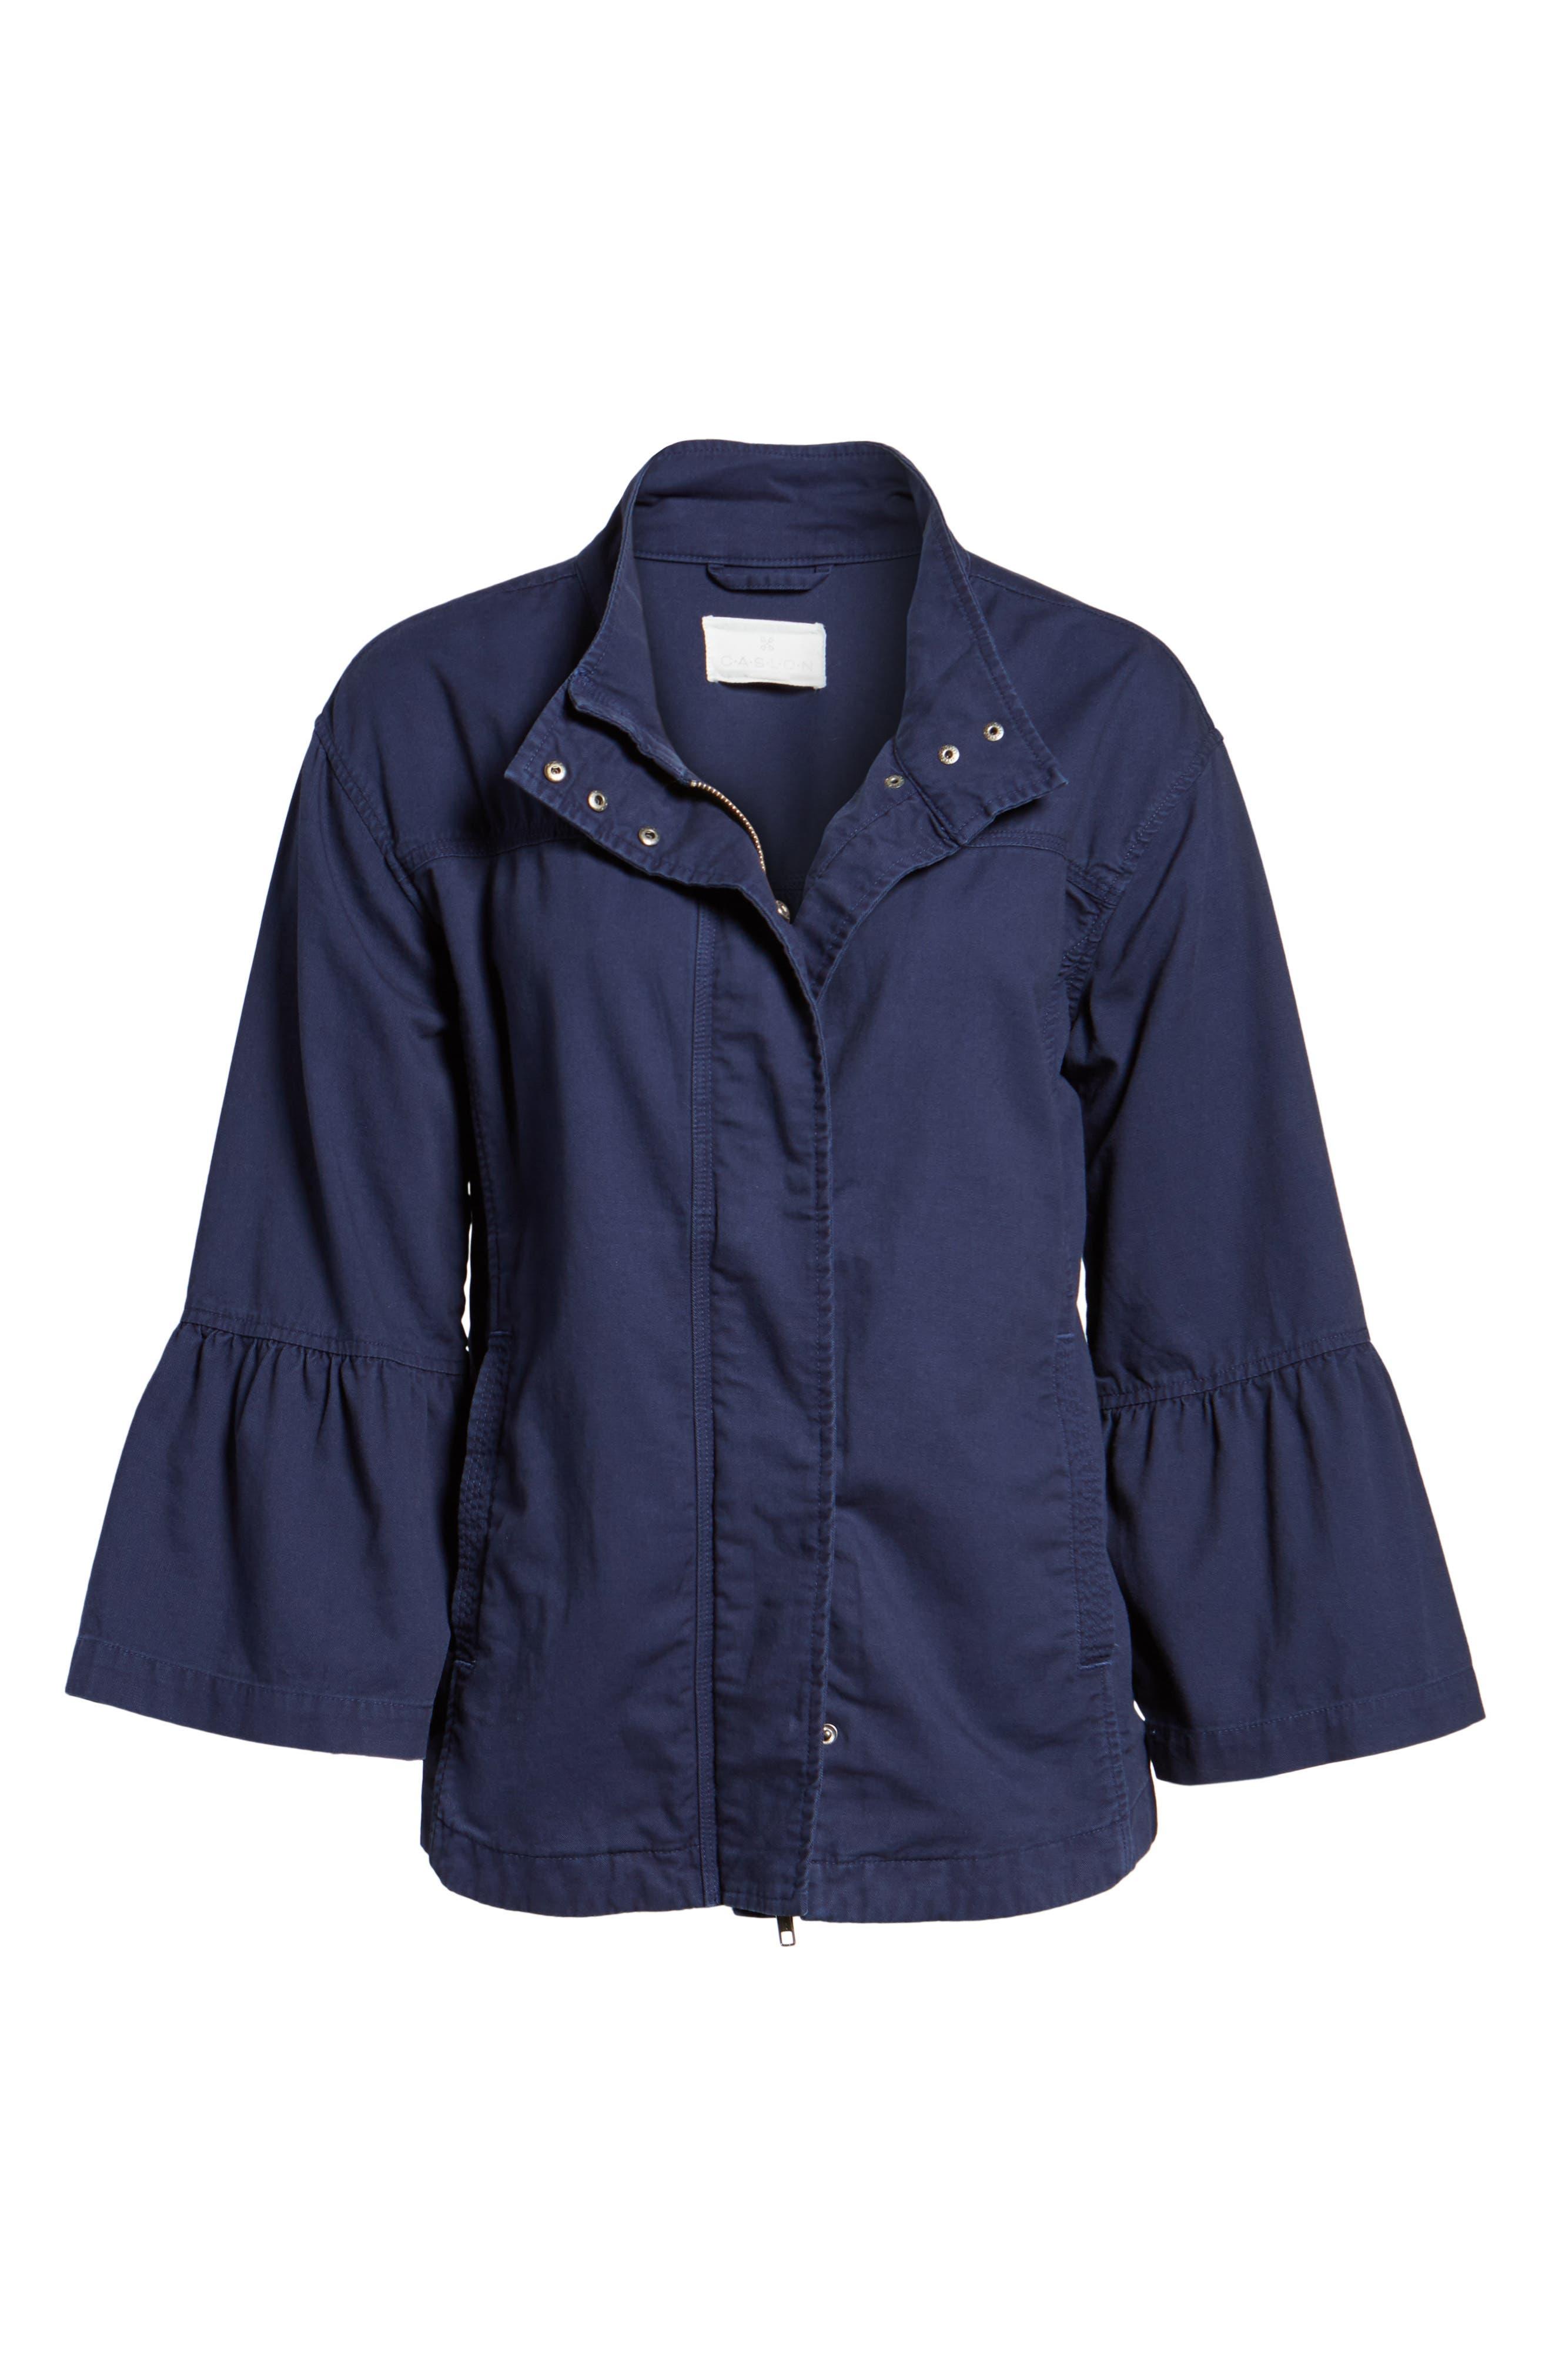 Flare Sleeve Utility Jacket,                             Alternate thumbnail 6, color,                             Navy